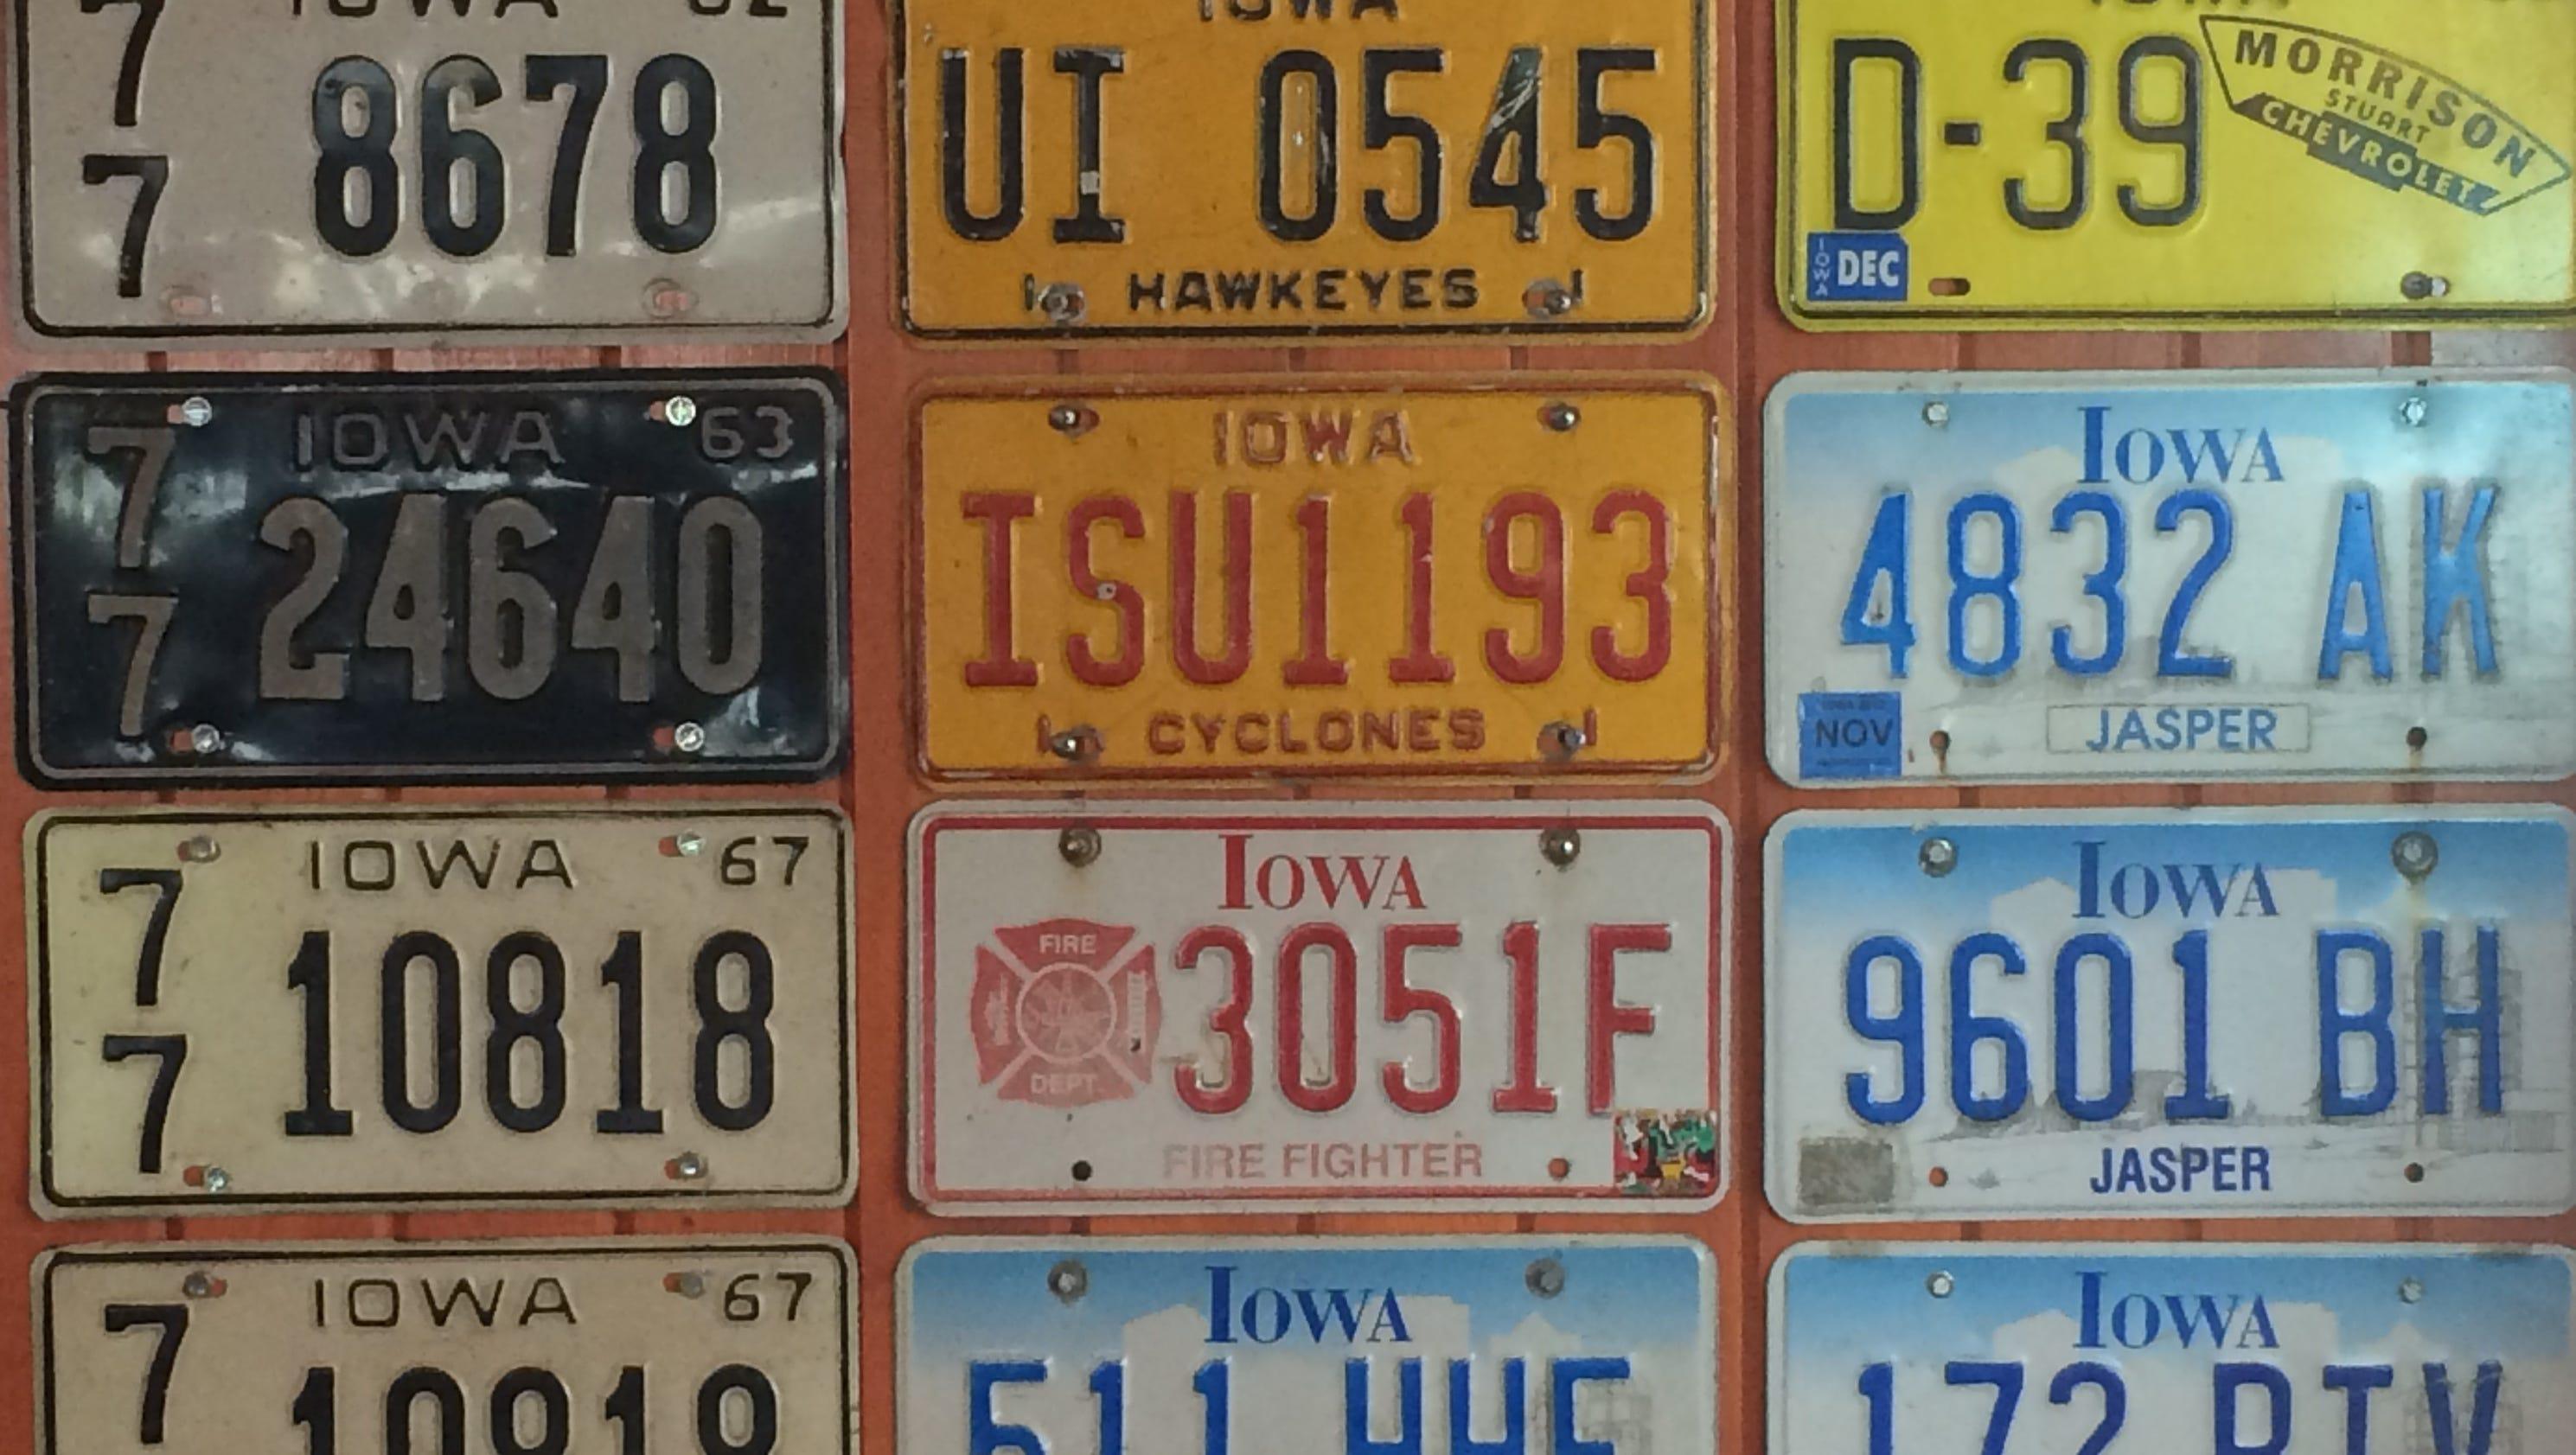 Bill to scrap one Iowa license plate resurfaces in Legislature